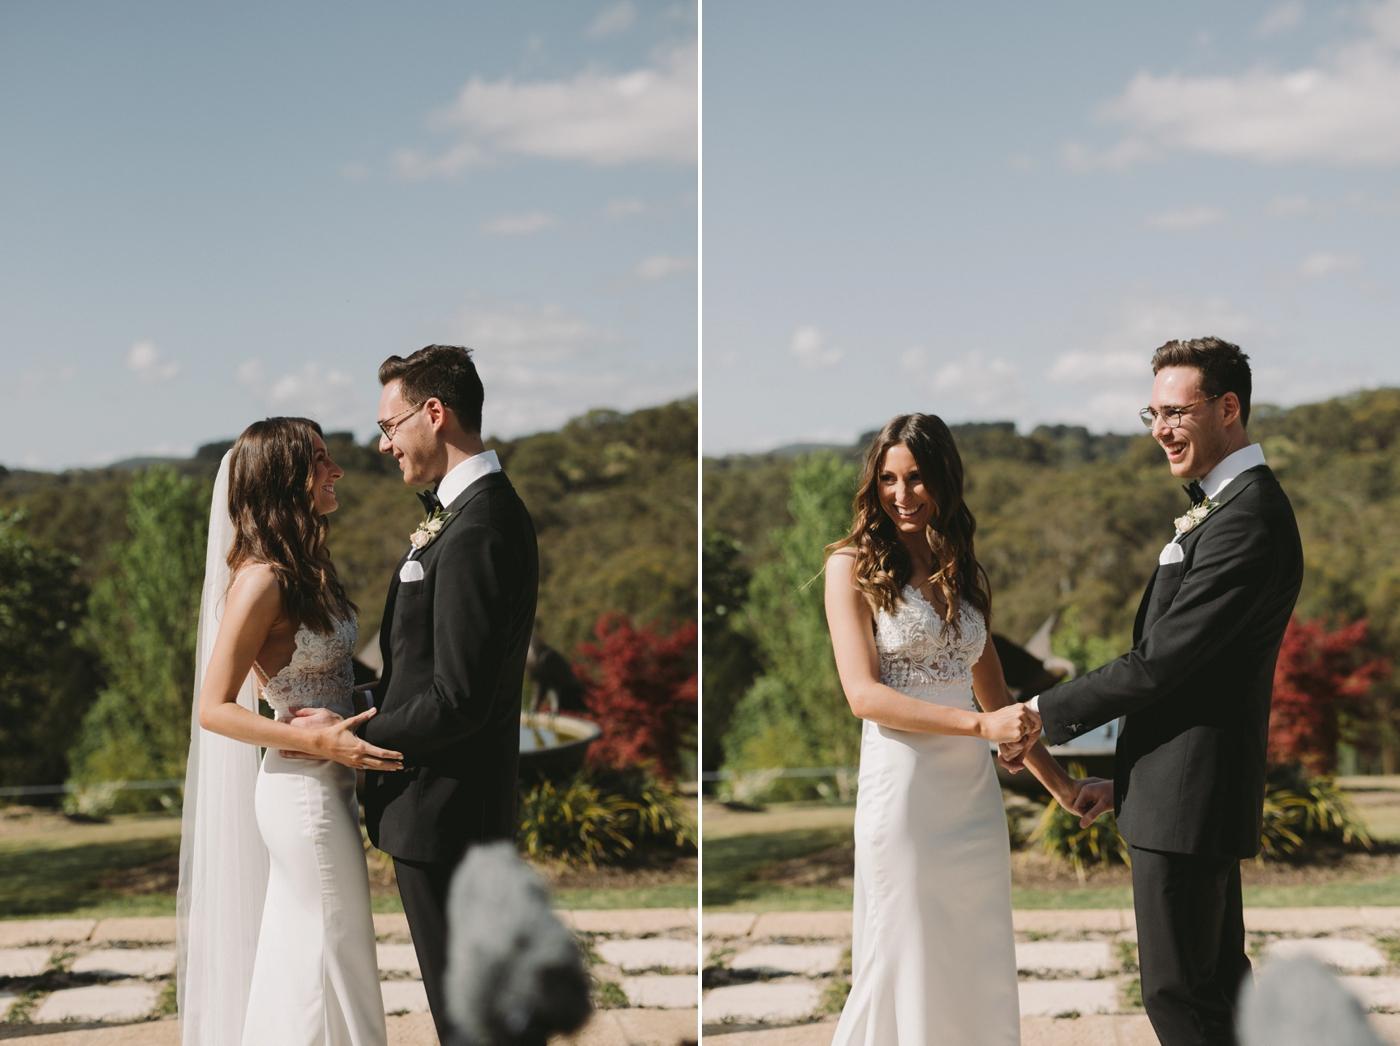 Katie and Ben - Natural Wedding Photography in Adelaide - Beautiful, Candid Wedding Photographer - Adelaide Hills Wedding - Katherine Schultz - www.katherineschultzphotography.com_0037.jpg